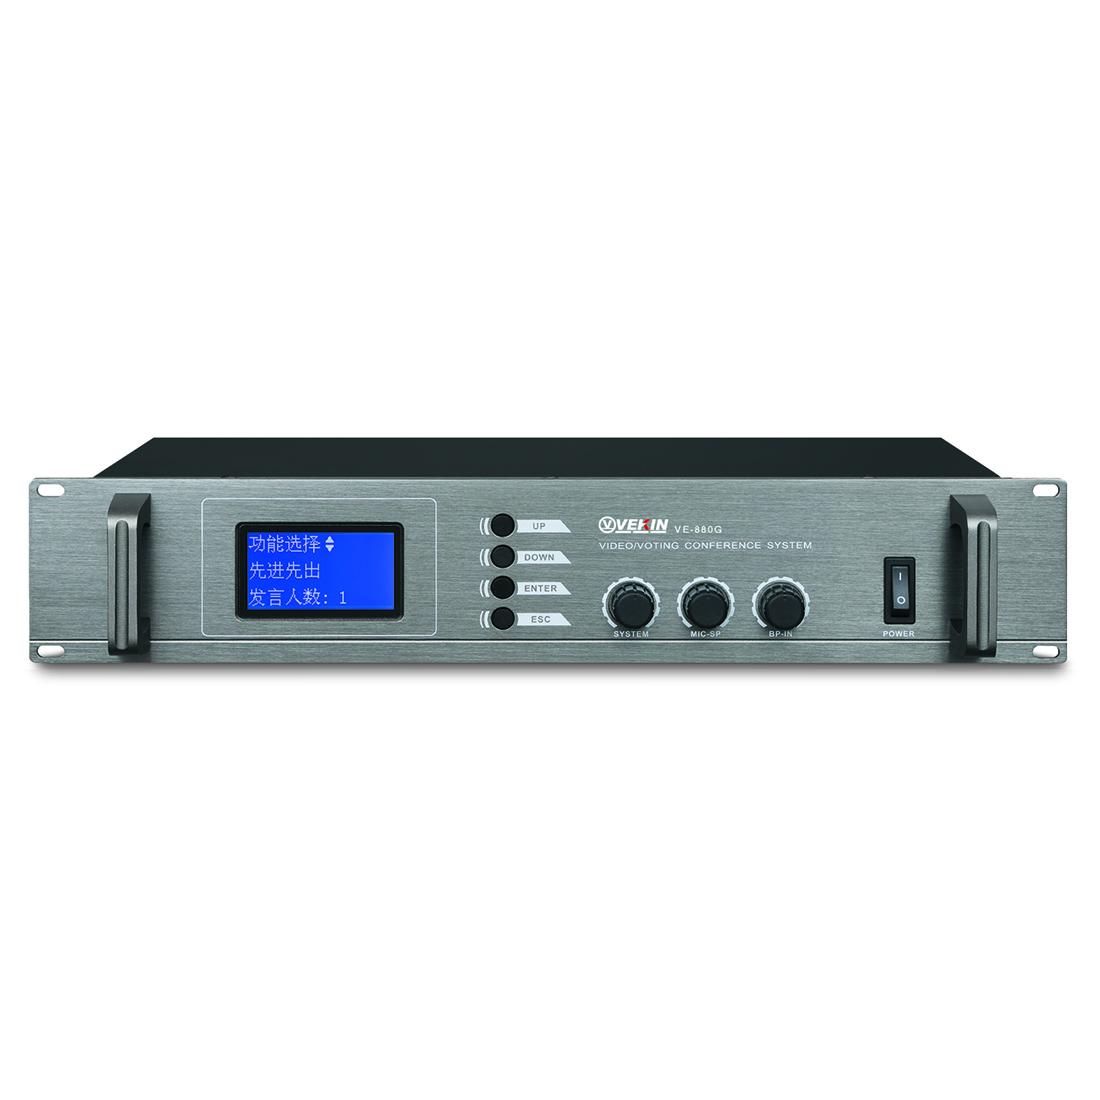 HD-SDI 高清视像多功能会议主机 VE-880G